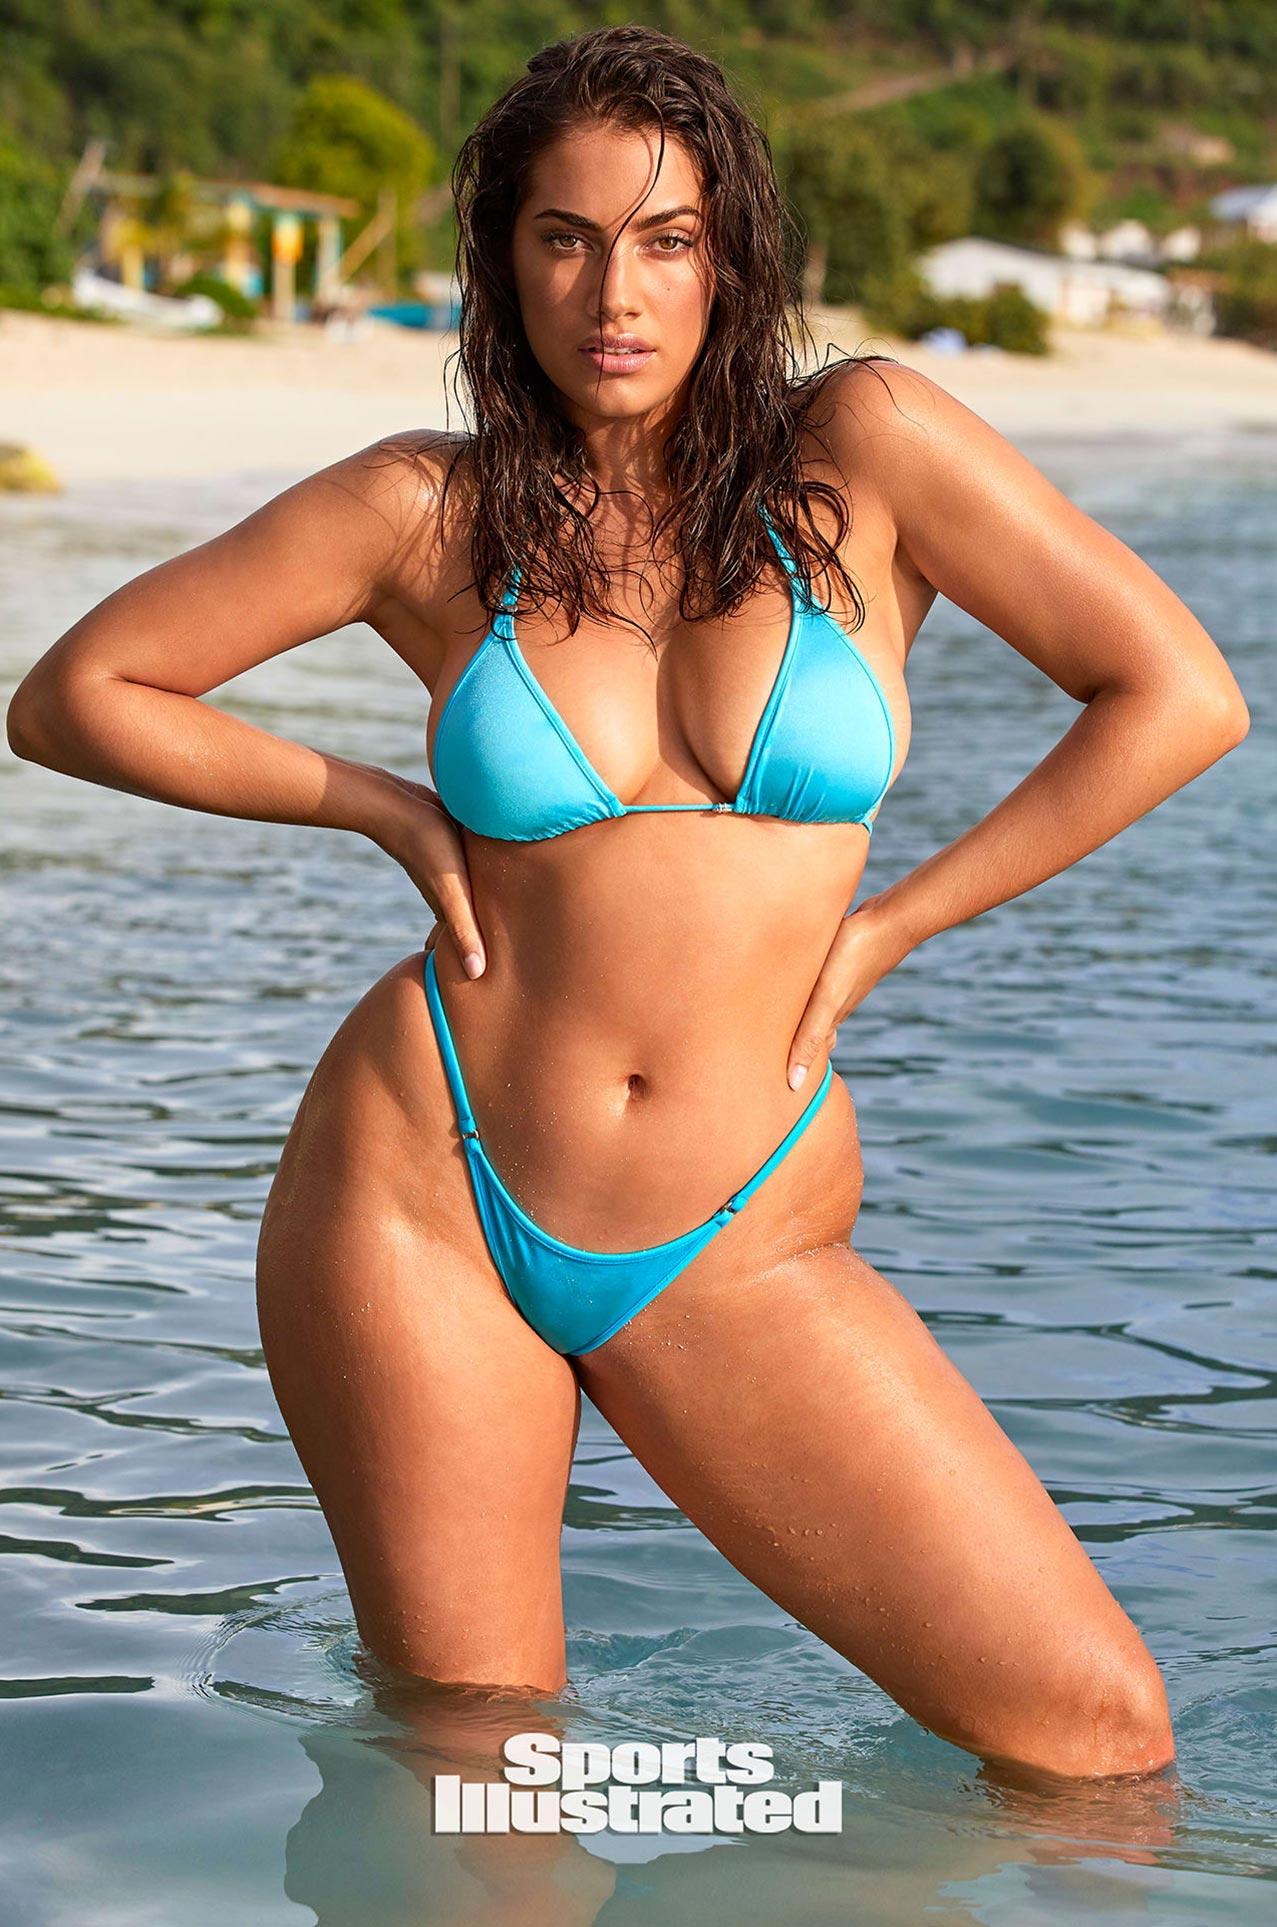 Лорена Дюран в каталоге купальников Sports Illustrated Swimsuit 2020 / фото 08